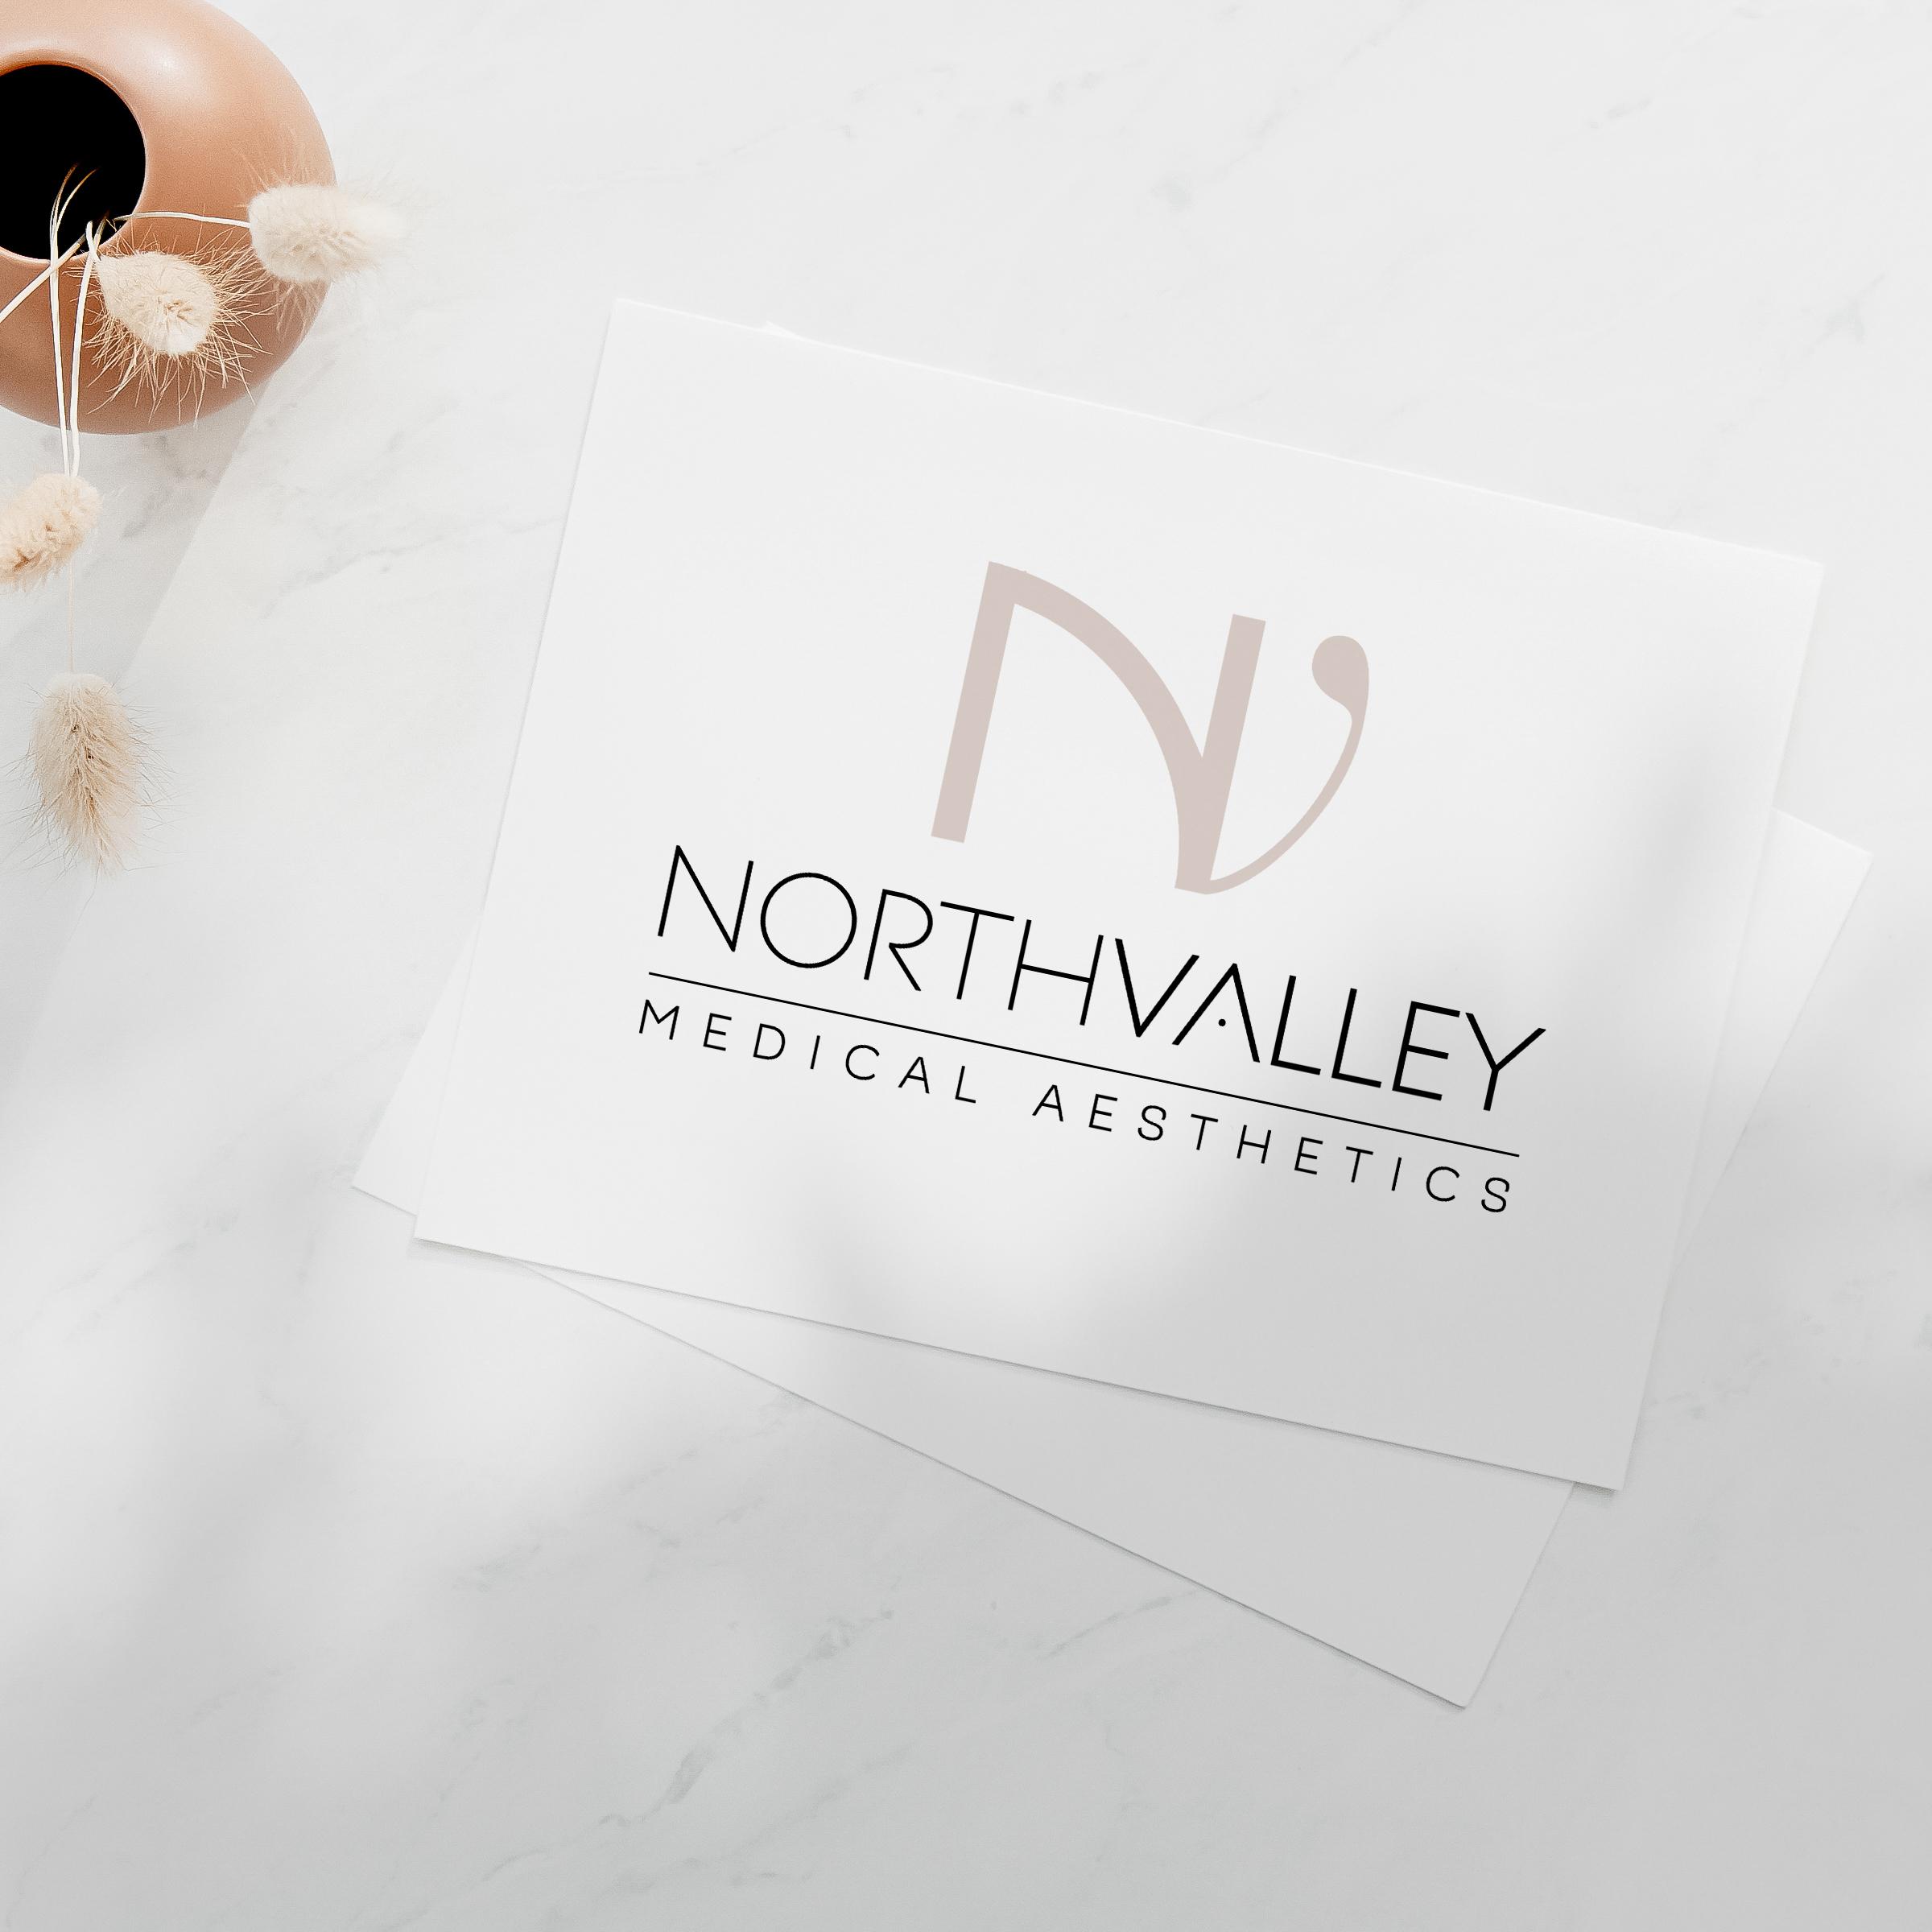 NorthValley_logo